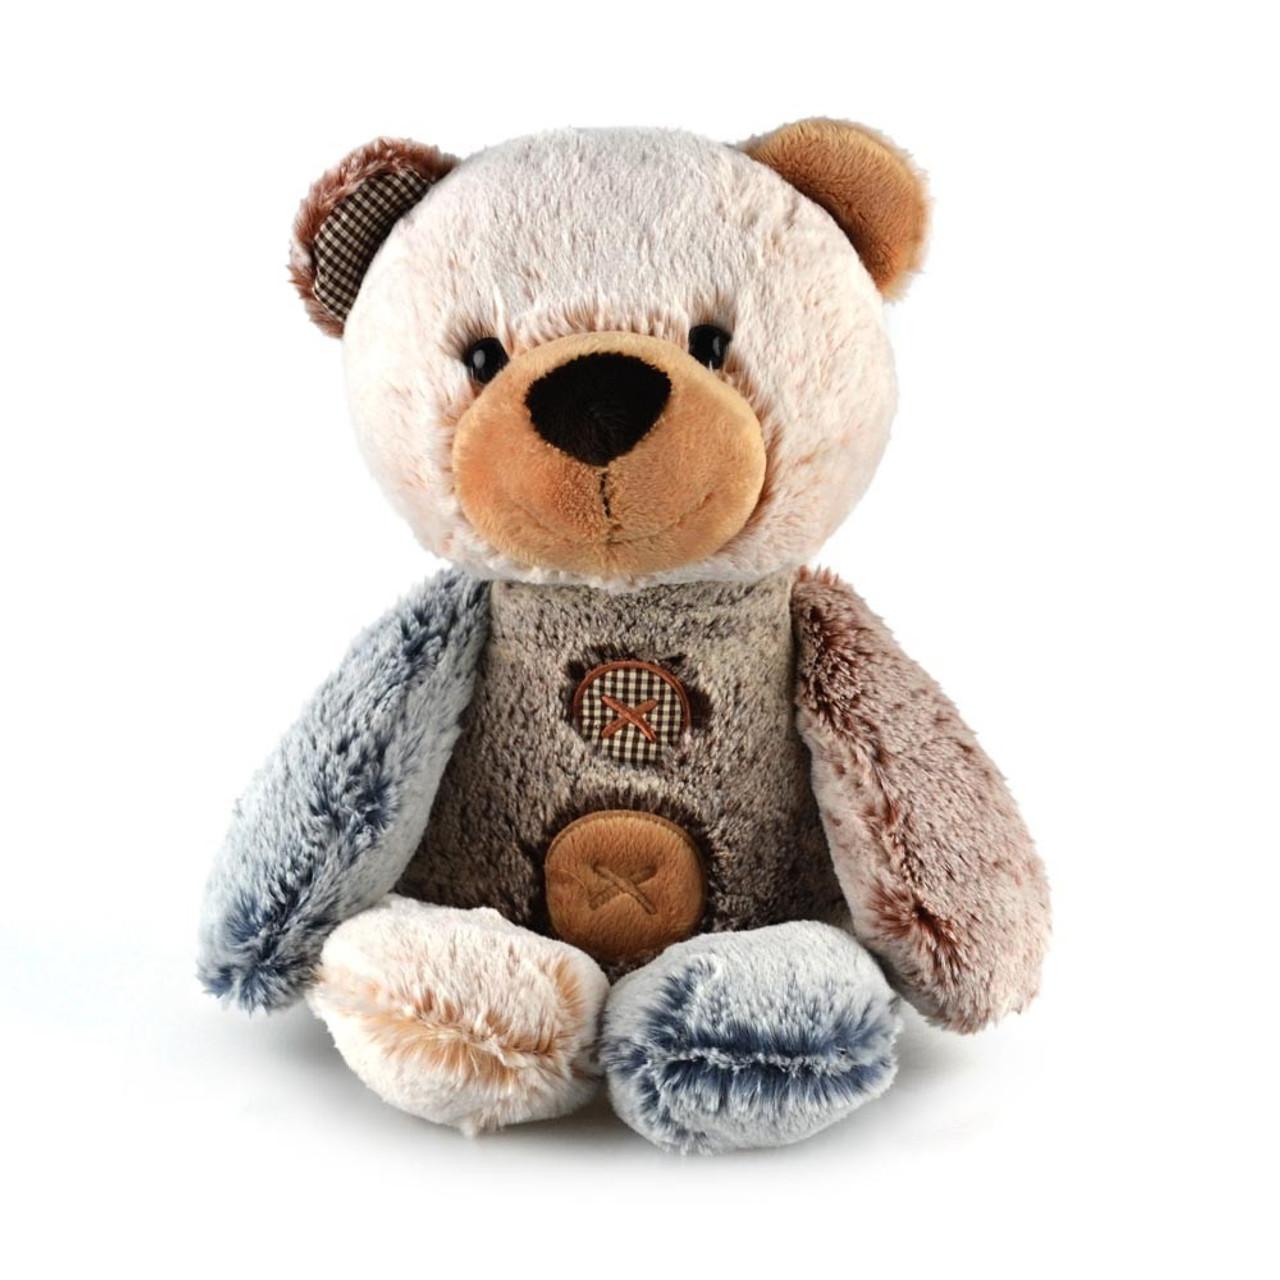 Korimco Patches the Bear Soft Plush Teddy Bear Large 40cm - BROWN